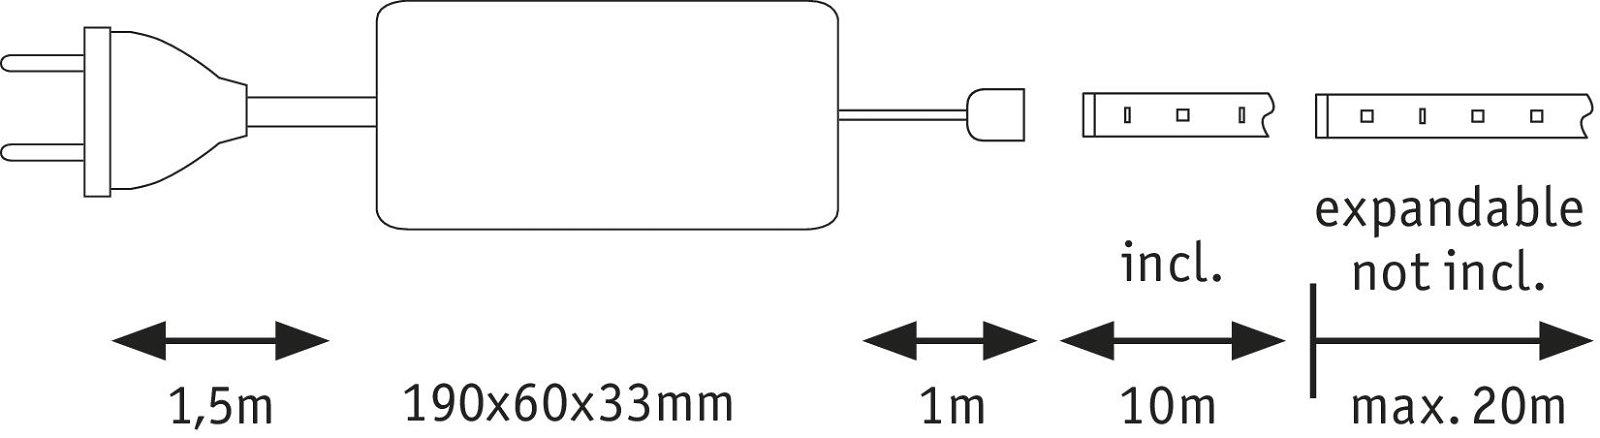 MaxLED 500 LED Strip Daglichtwit 10m 50W 5500lm 6500K 75VA